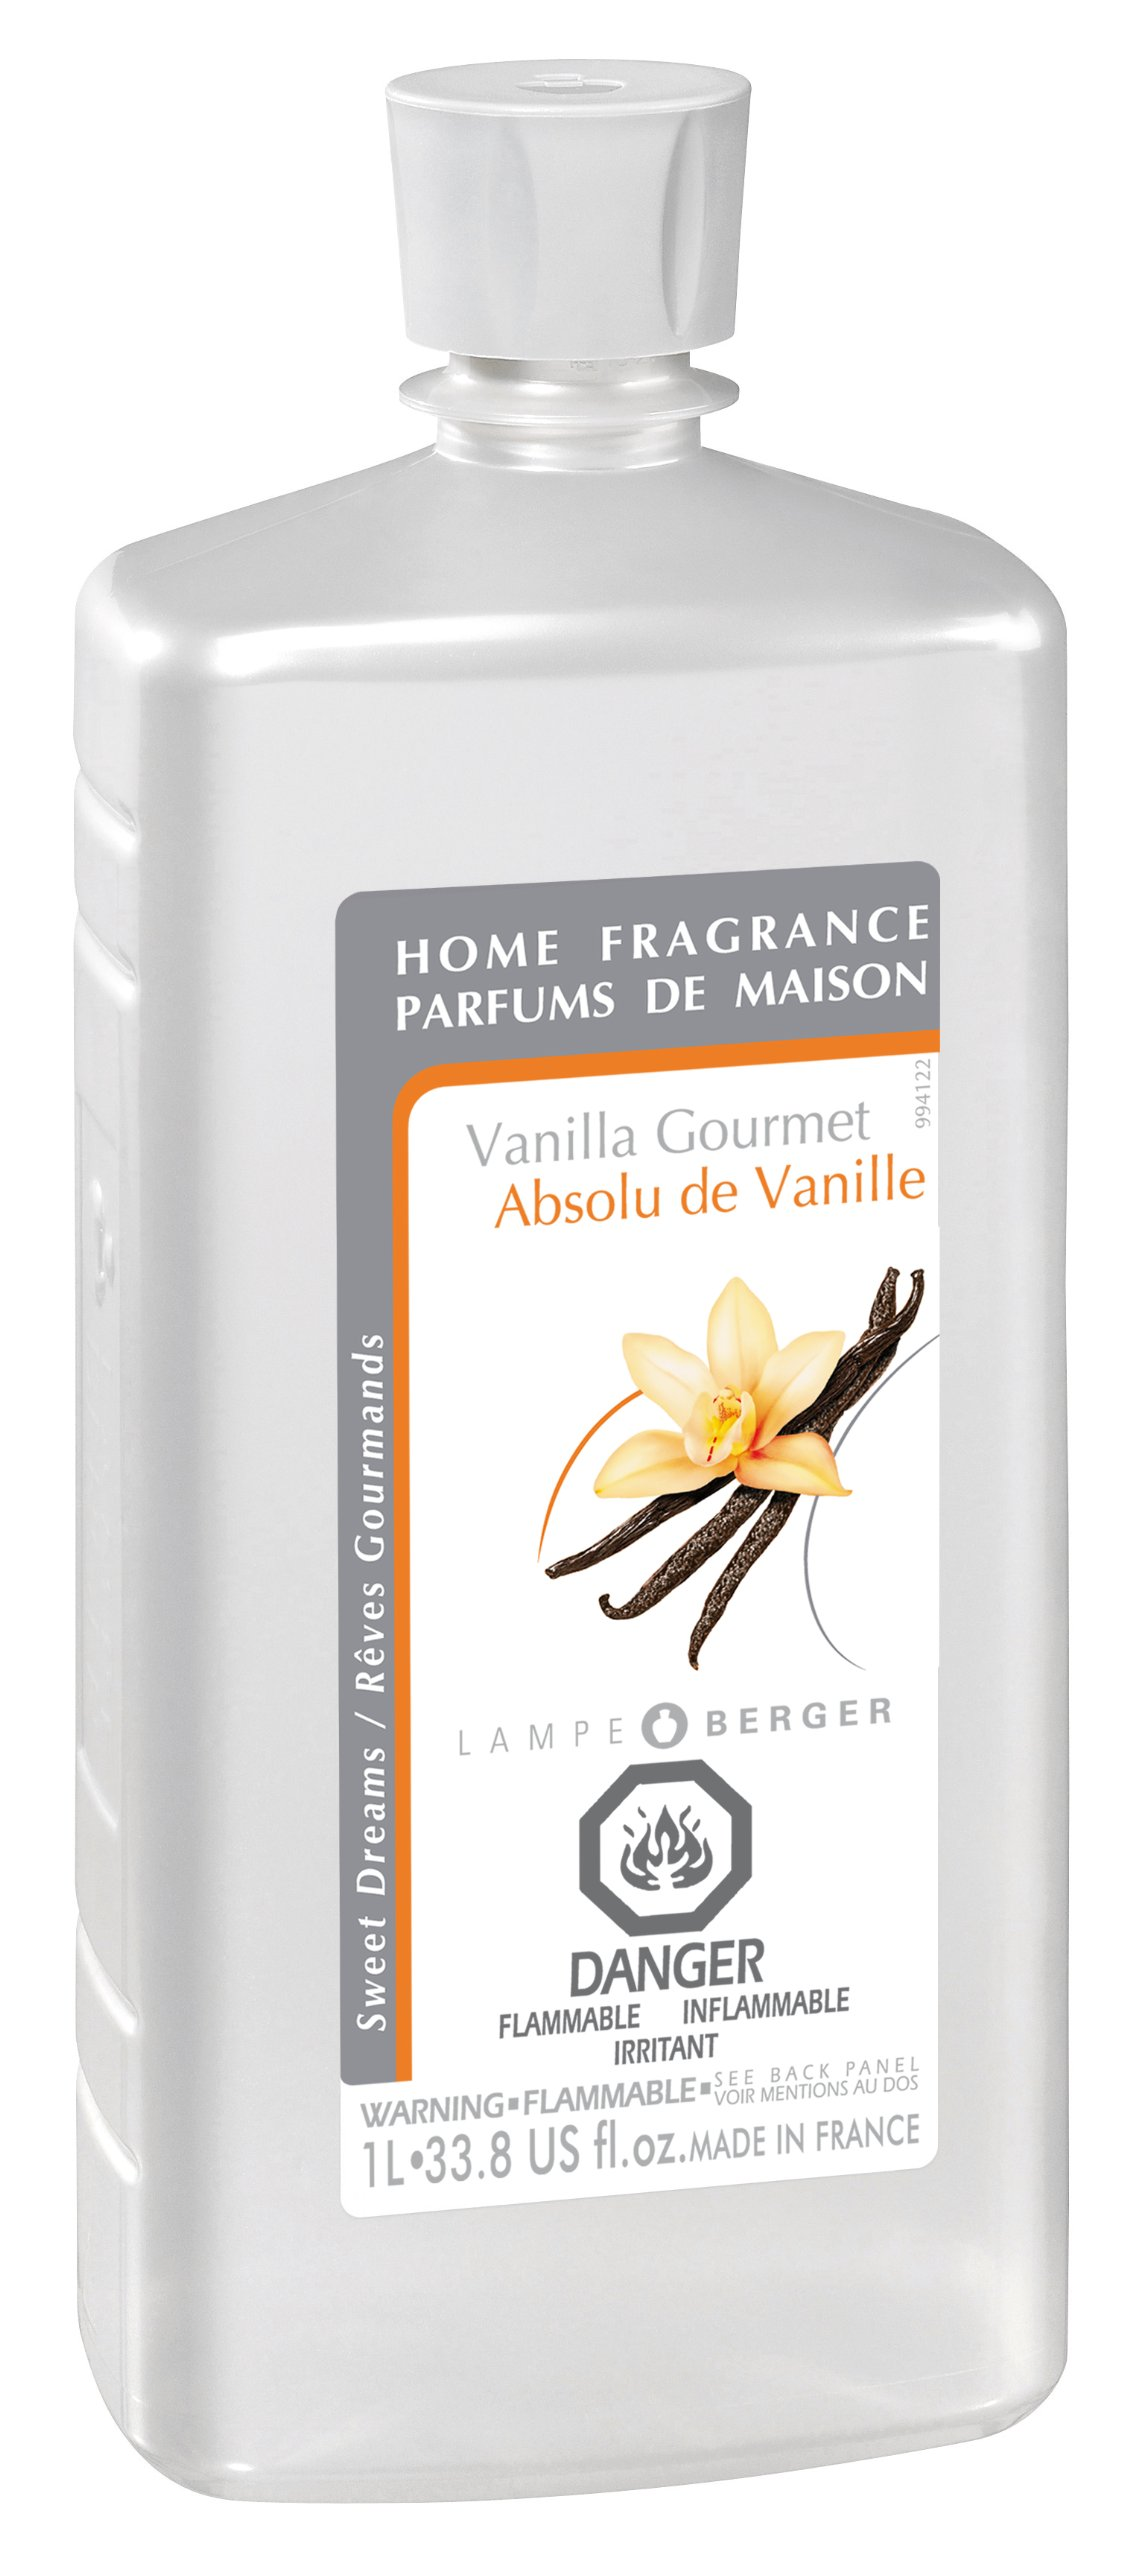 Lampe Berger Fragrance, 33.8 Fluid Ounce, Vanilla Gourmet